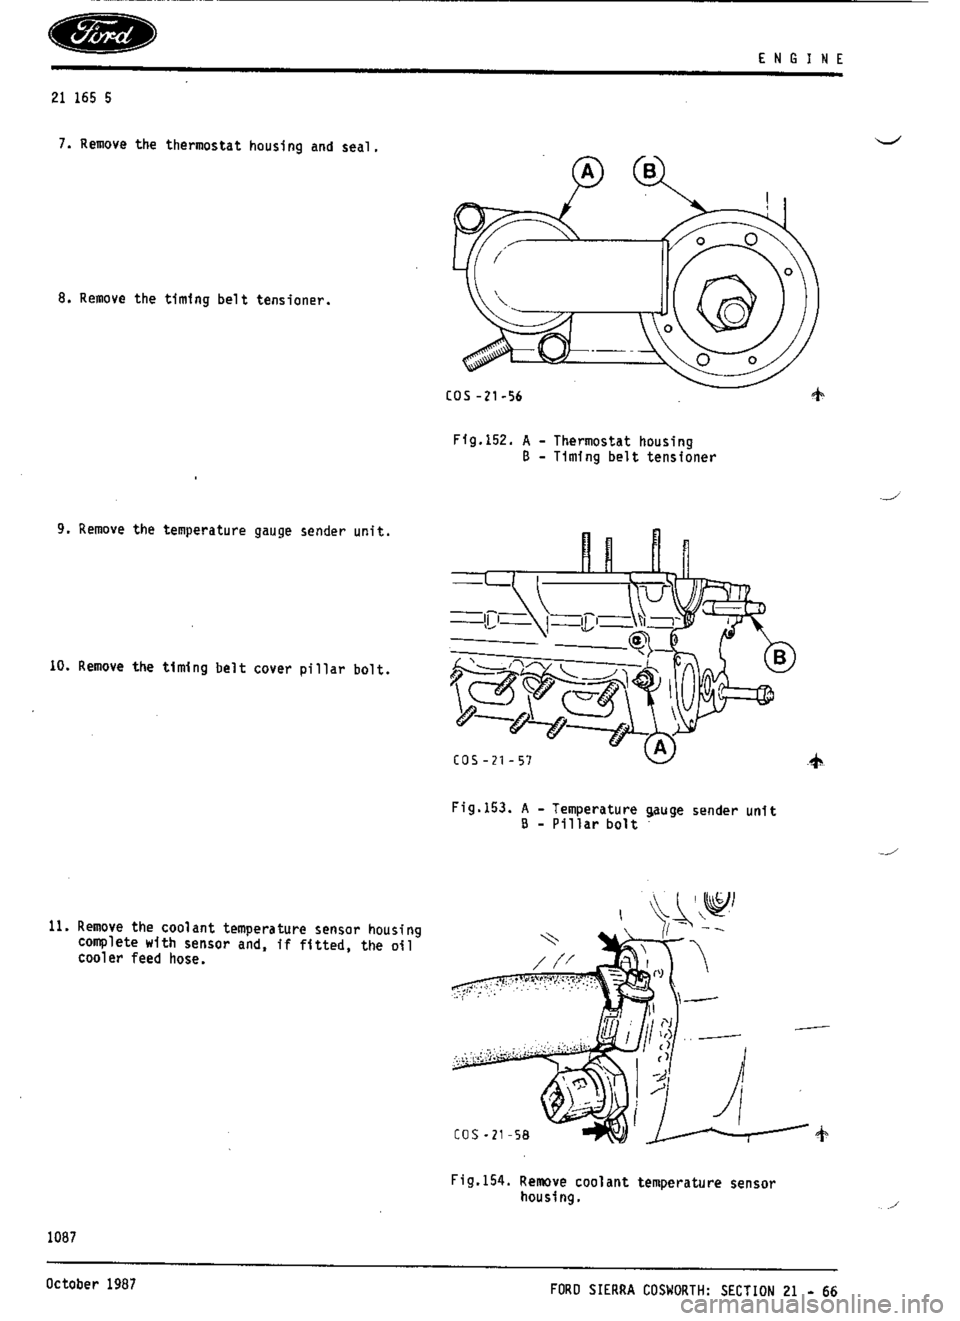 medium resolution of 2000 oldsmobile bravada engine diagram html 2002 oldsmobile bravada fuse diagram 2002 oldsmobile bravada body parts